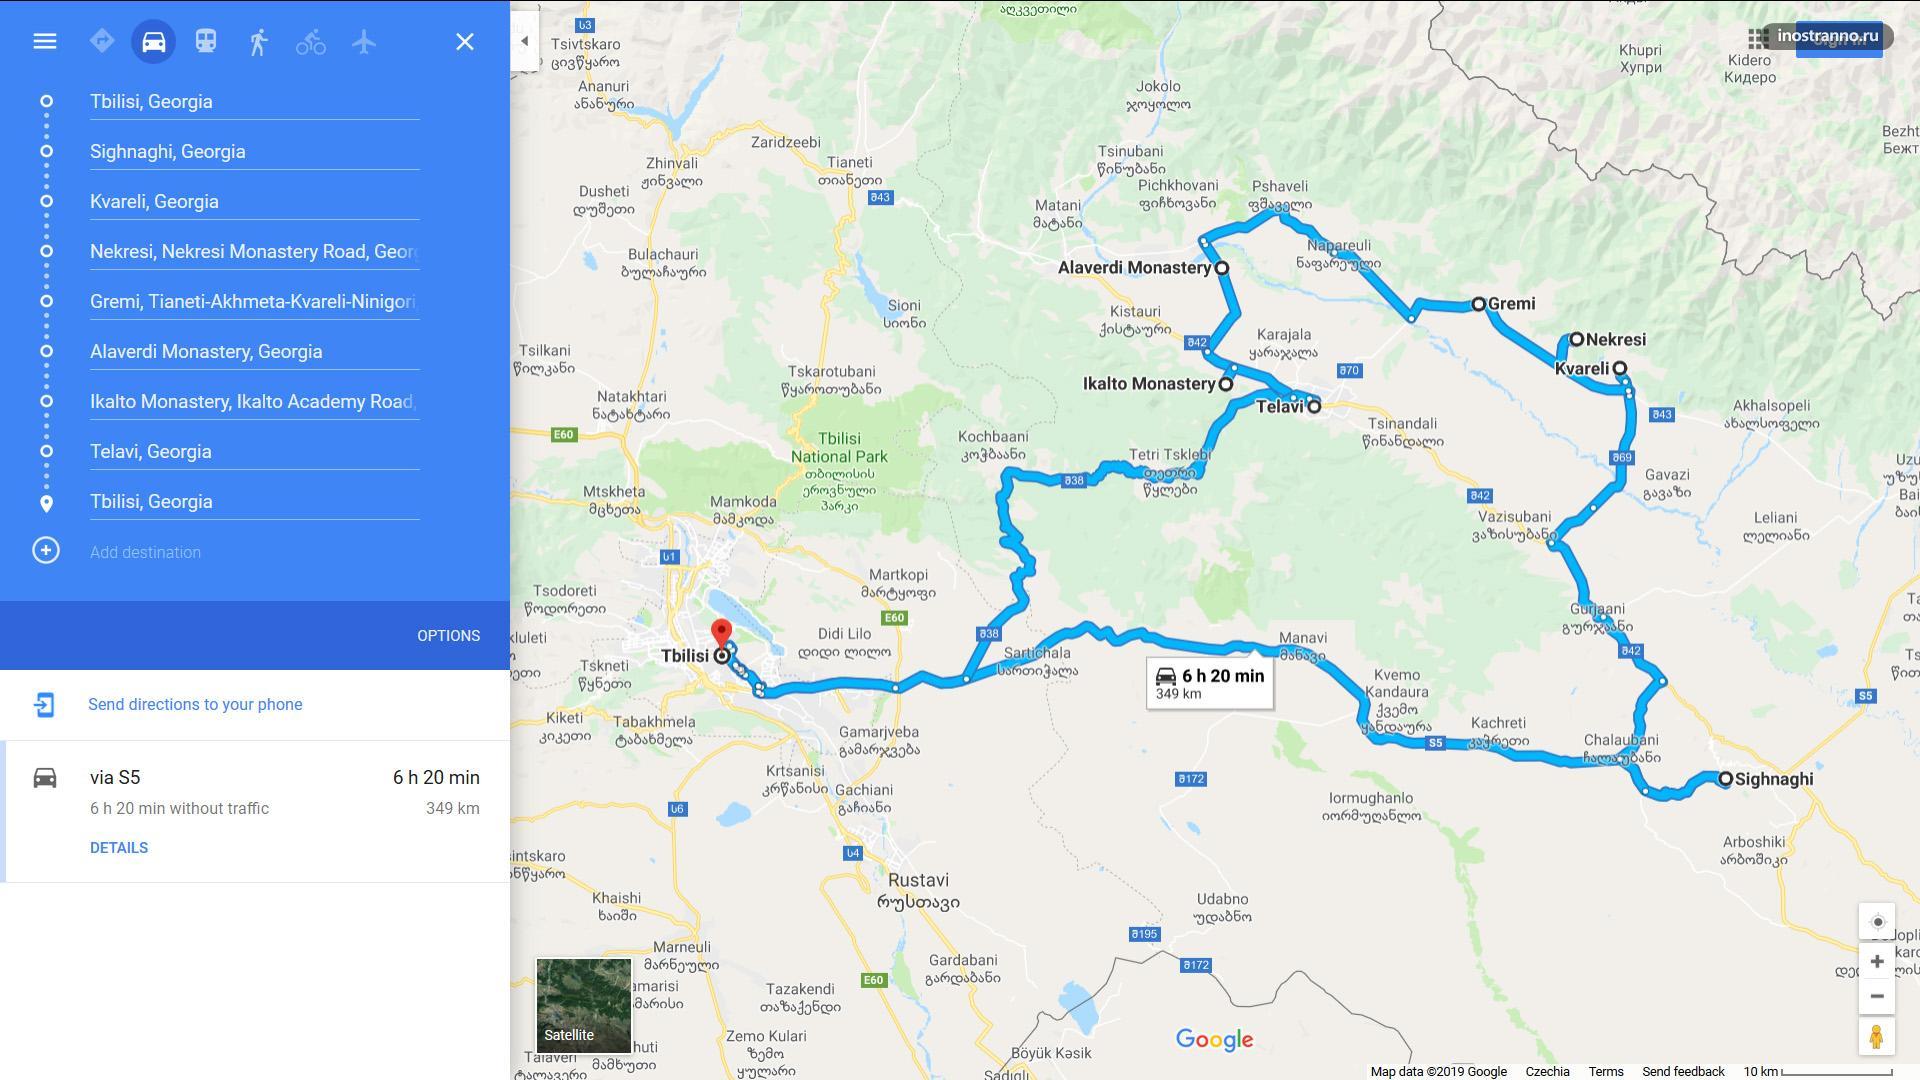 Карта маршрута по Кахетии на 1 день